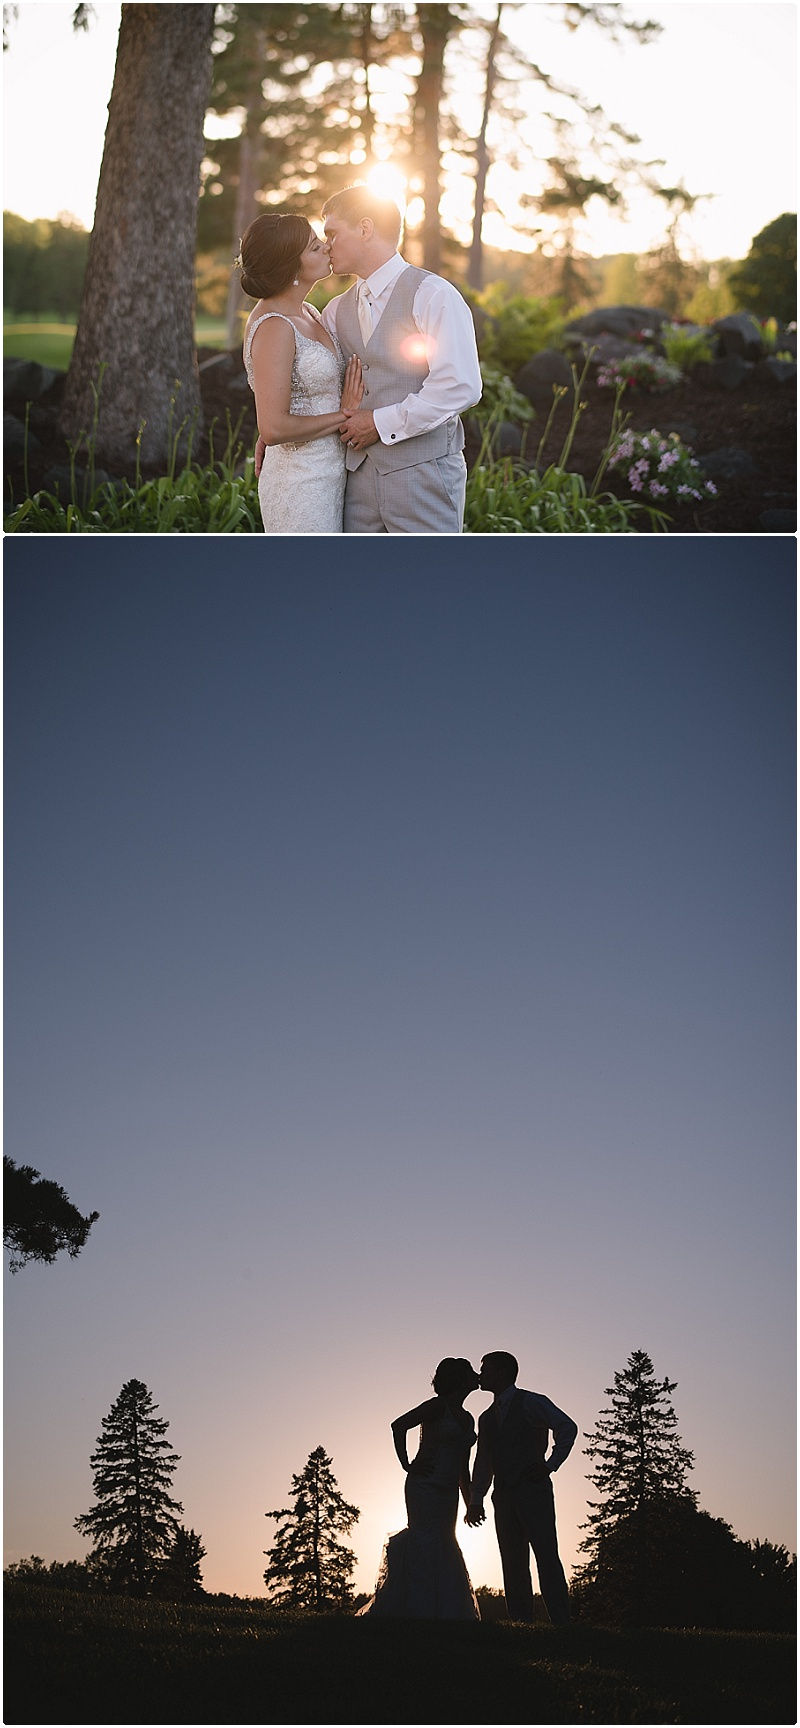 Gianna's Photography Wedding Dellwood Country Club Minnesota (15).jpg